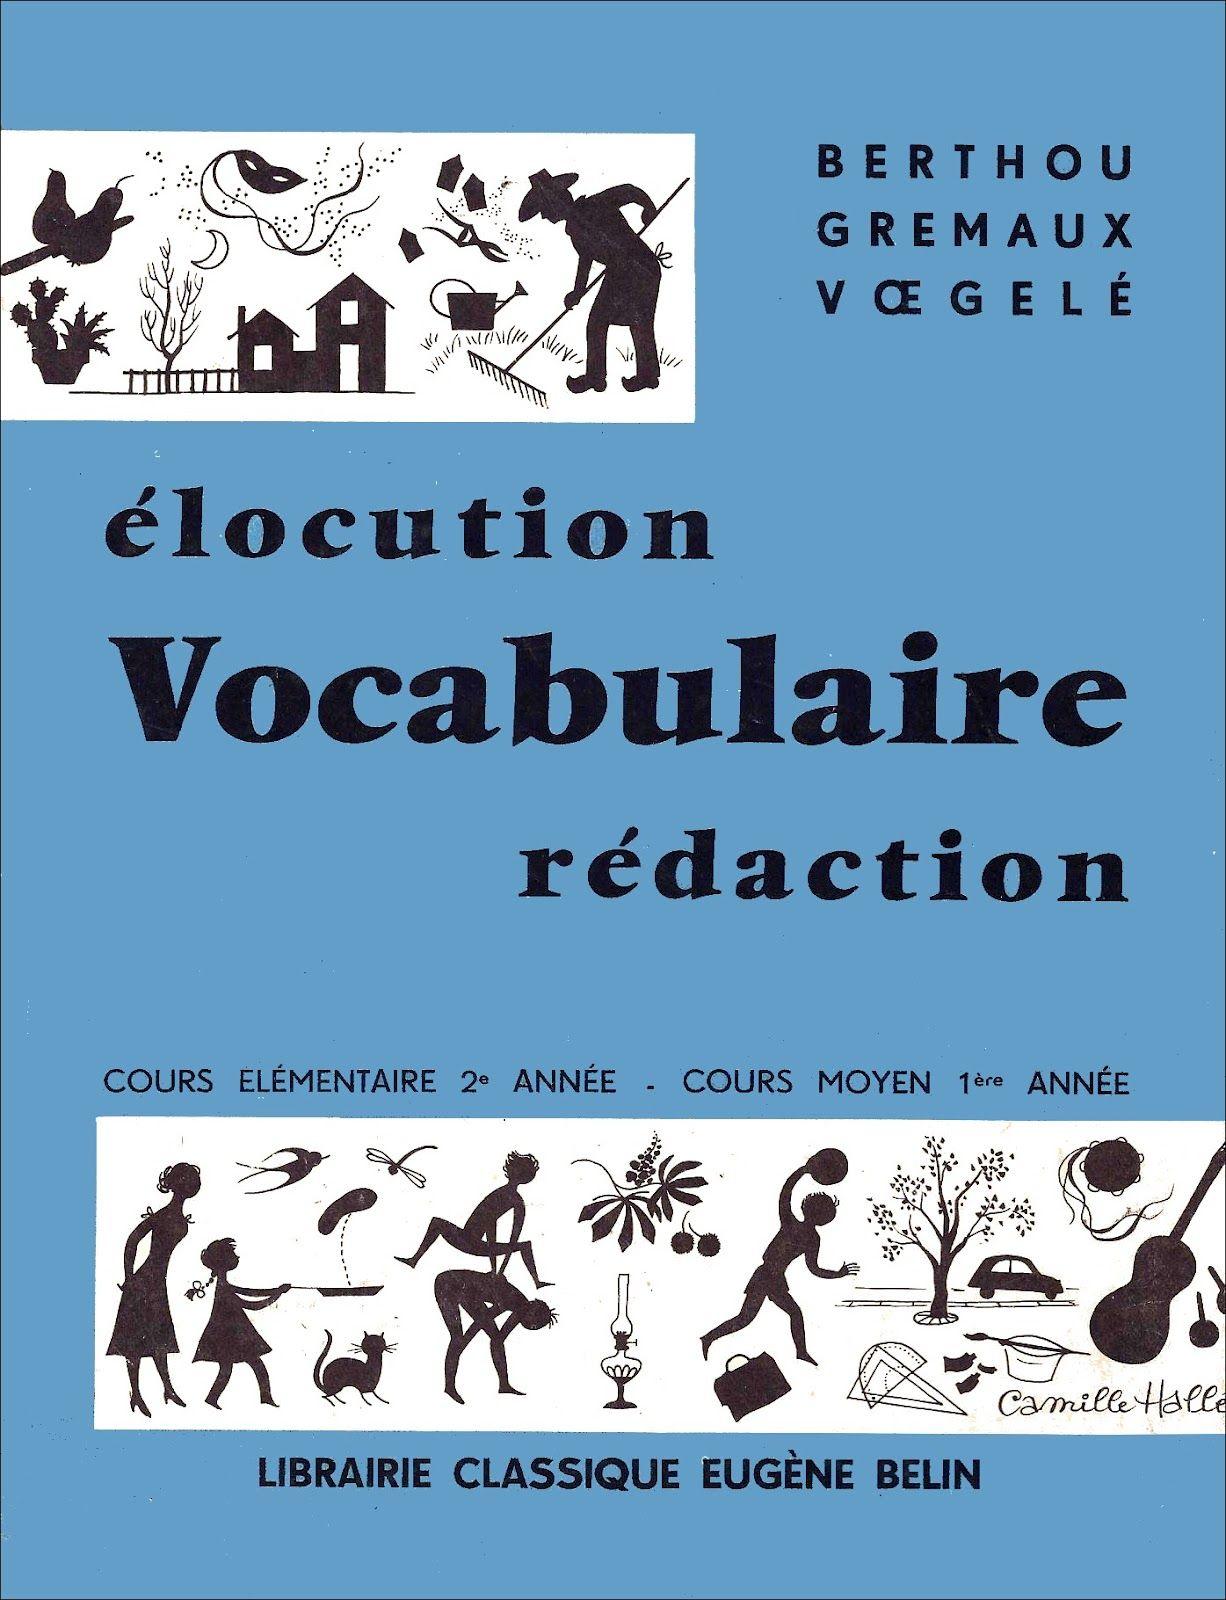 Berthou Elocution Vocabulaire Redaction Ce2 Cm1 Livres